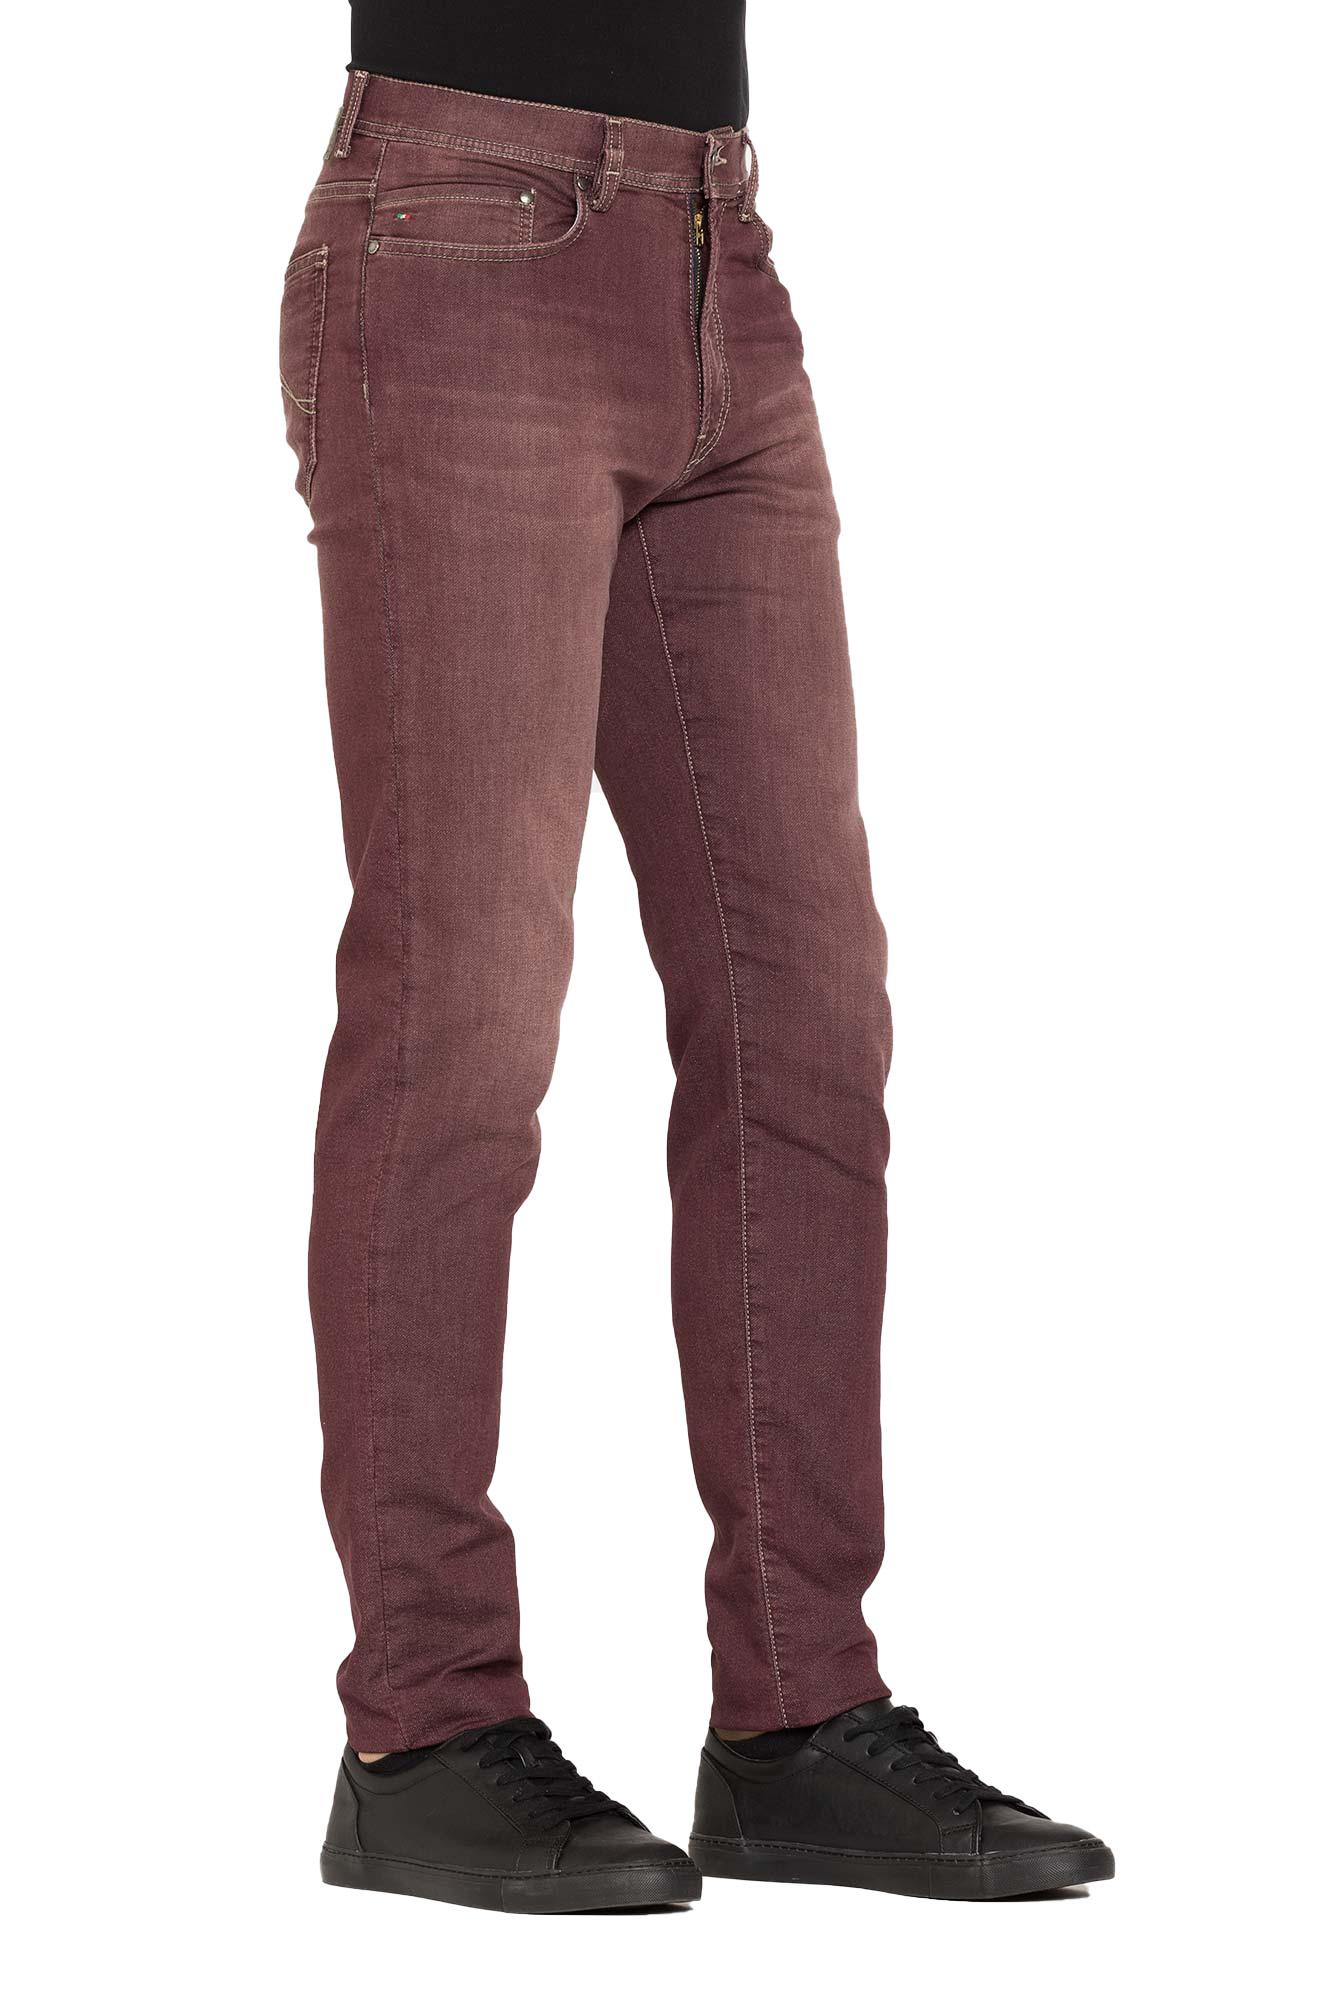 Carrera-Jeans-Jeans-per-uomo-tinta-unita miniatura 9